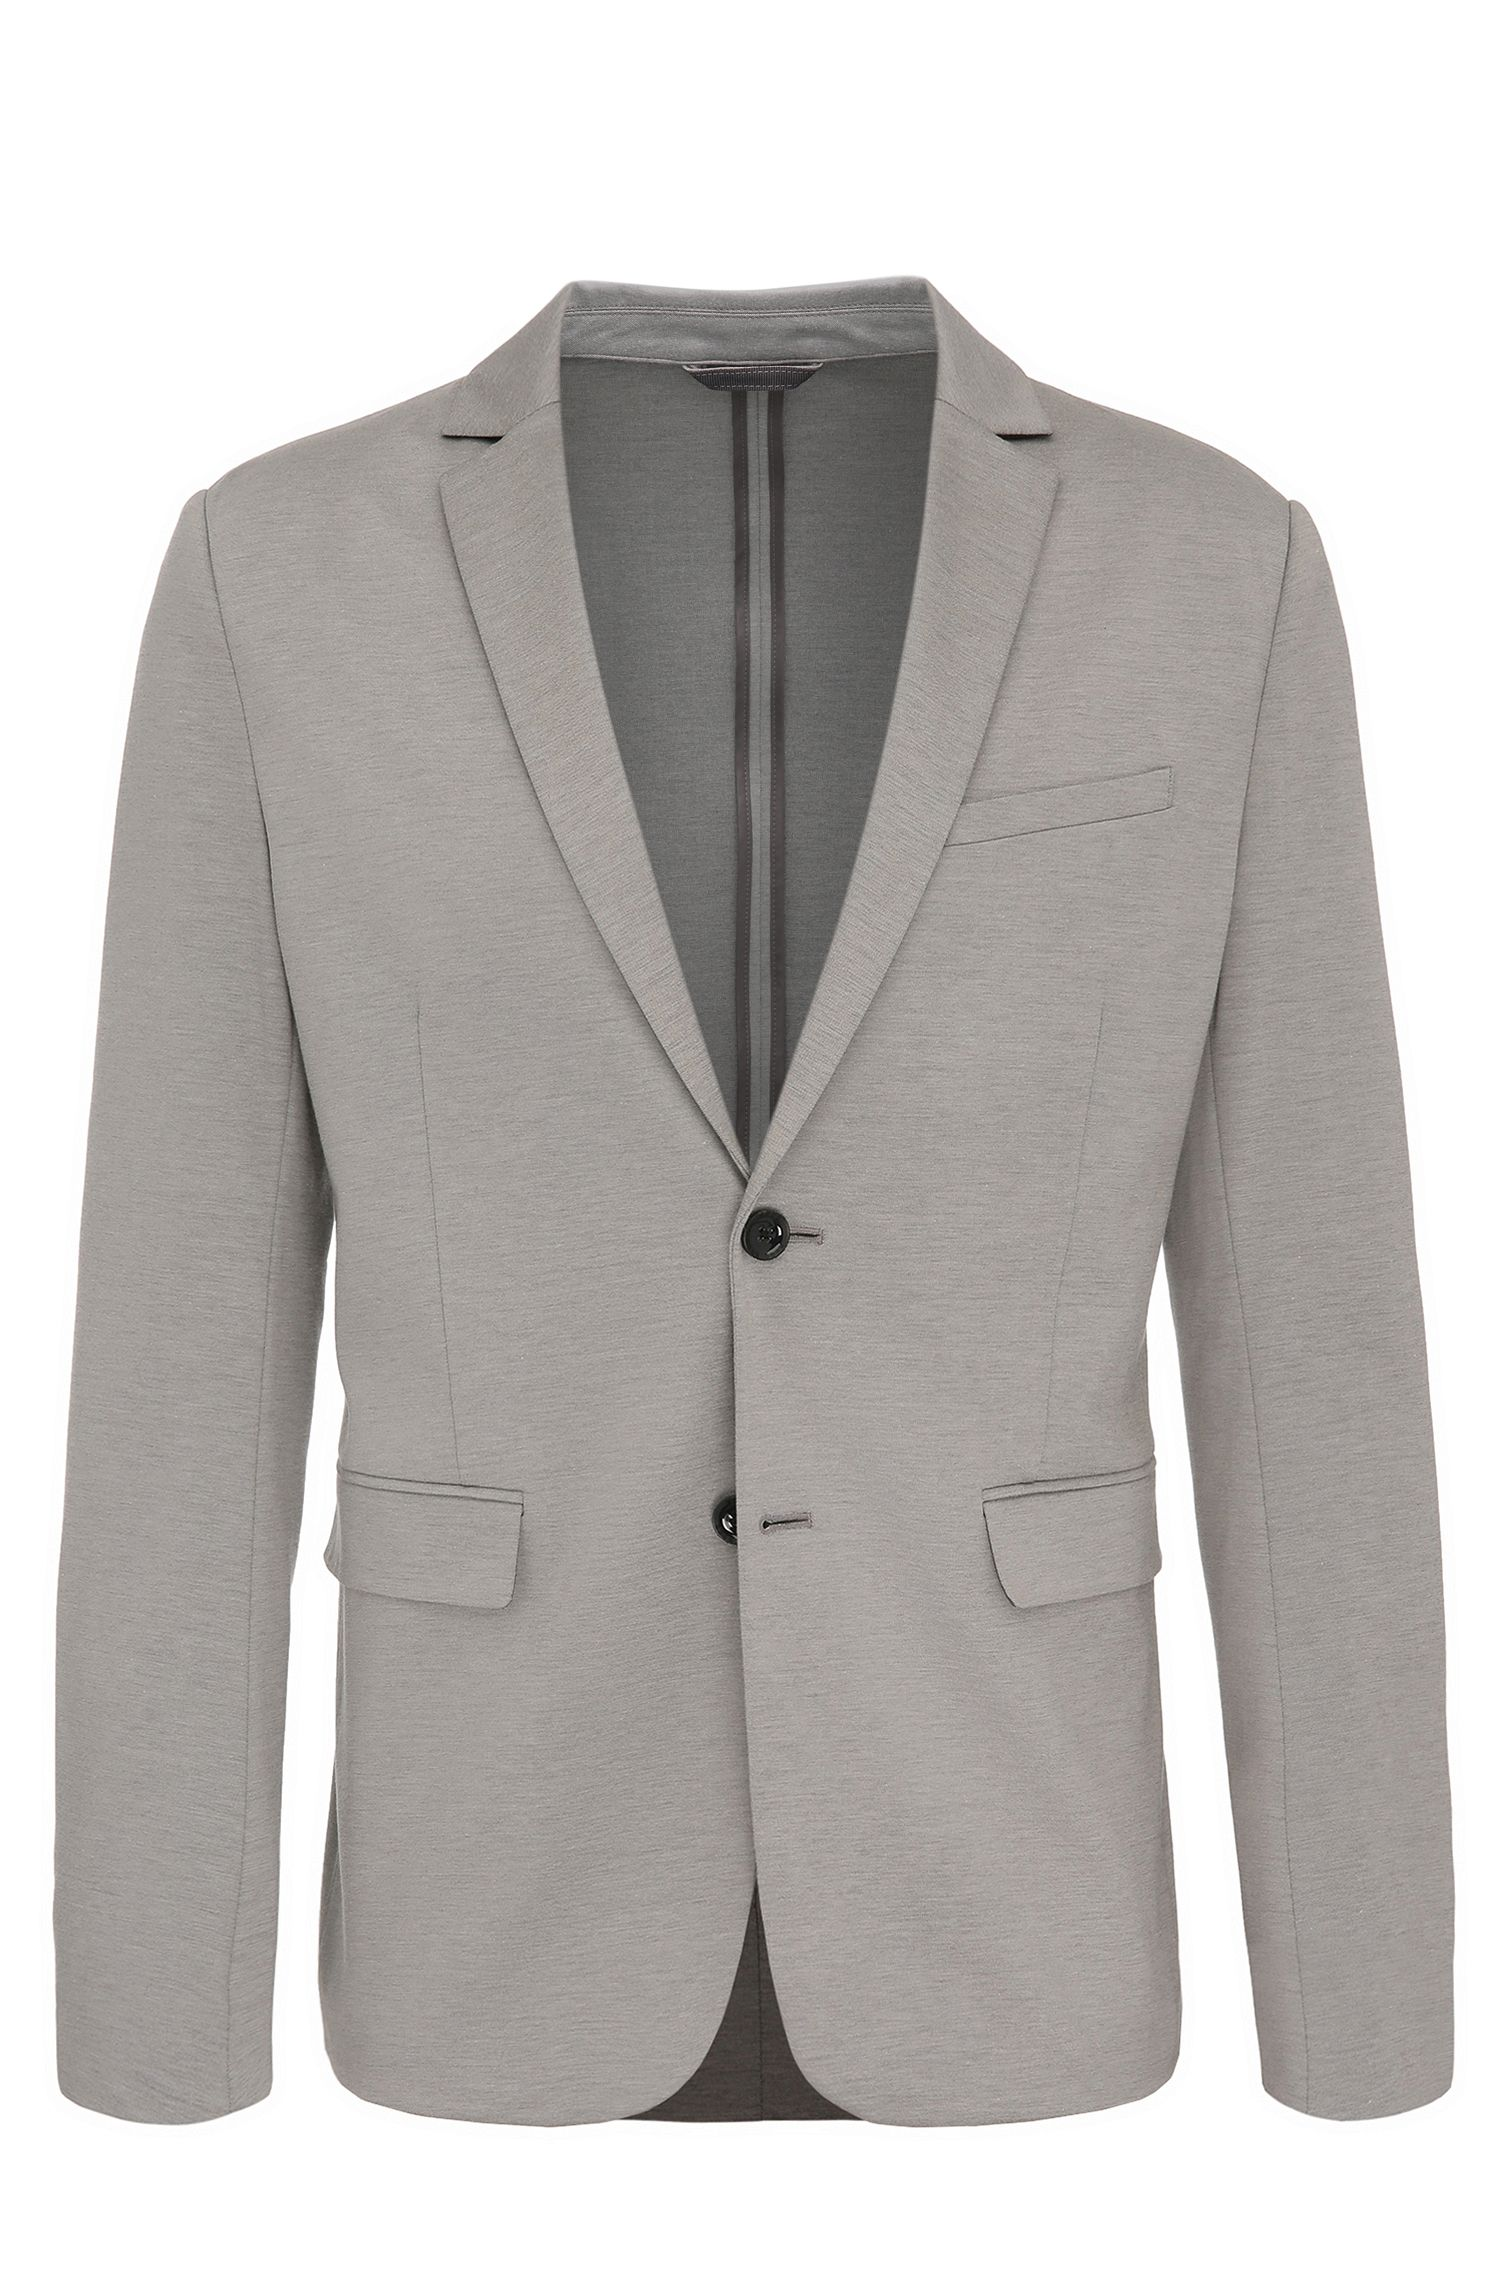 Cotton Blend Melange Jersey Sport Coat, Slim Fit | Aloon